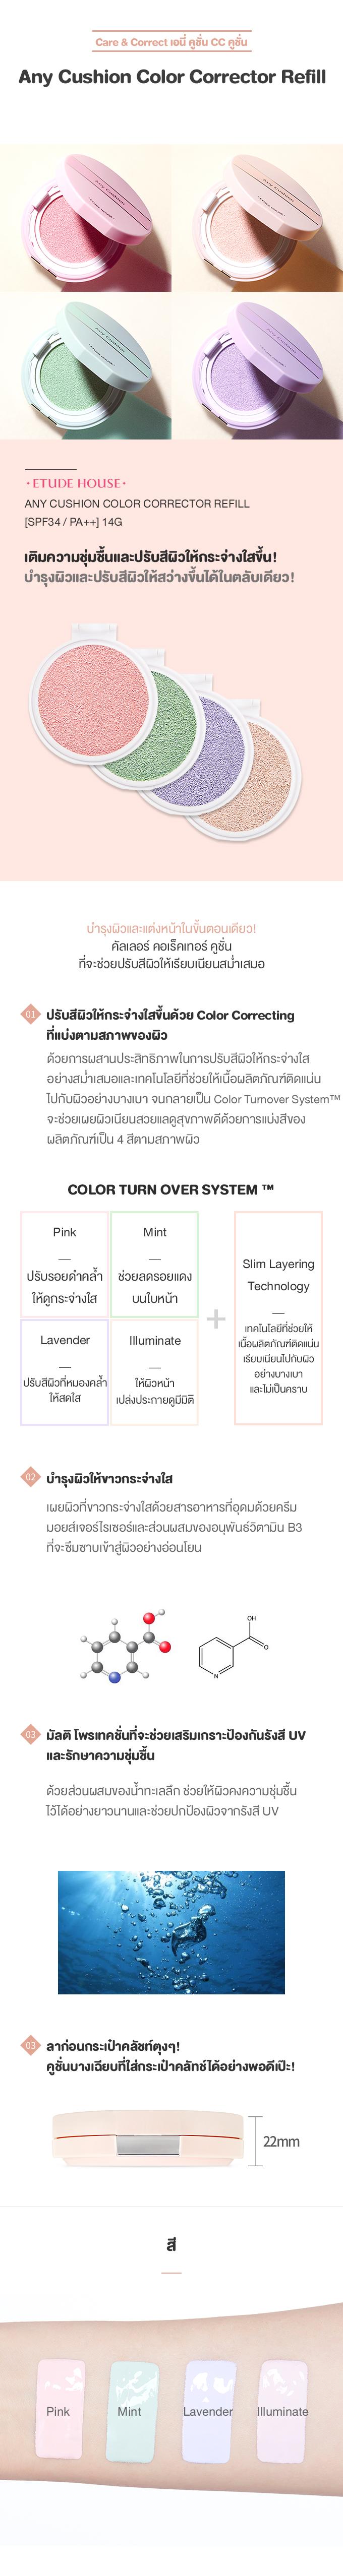 Any Cushion Color Corrector Refill_01